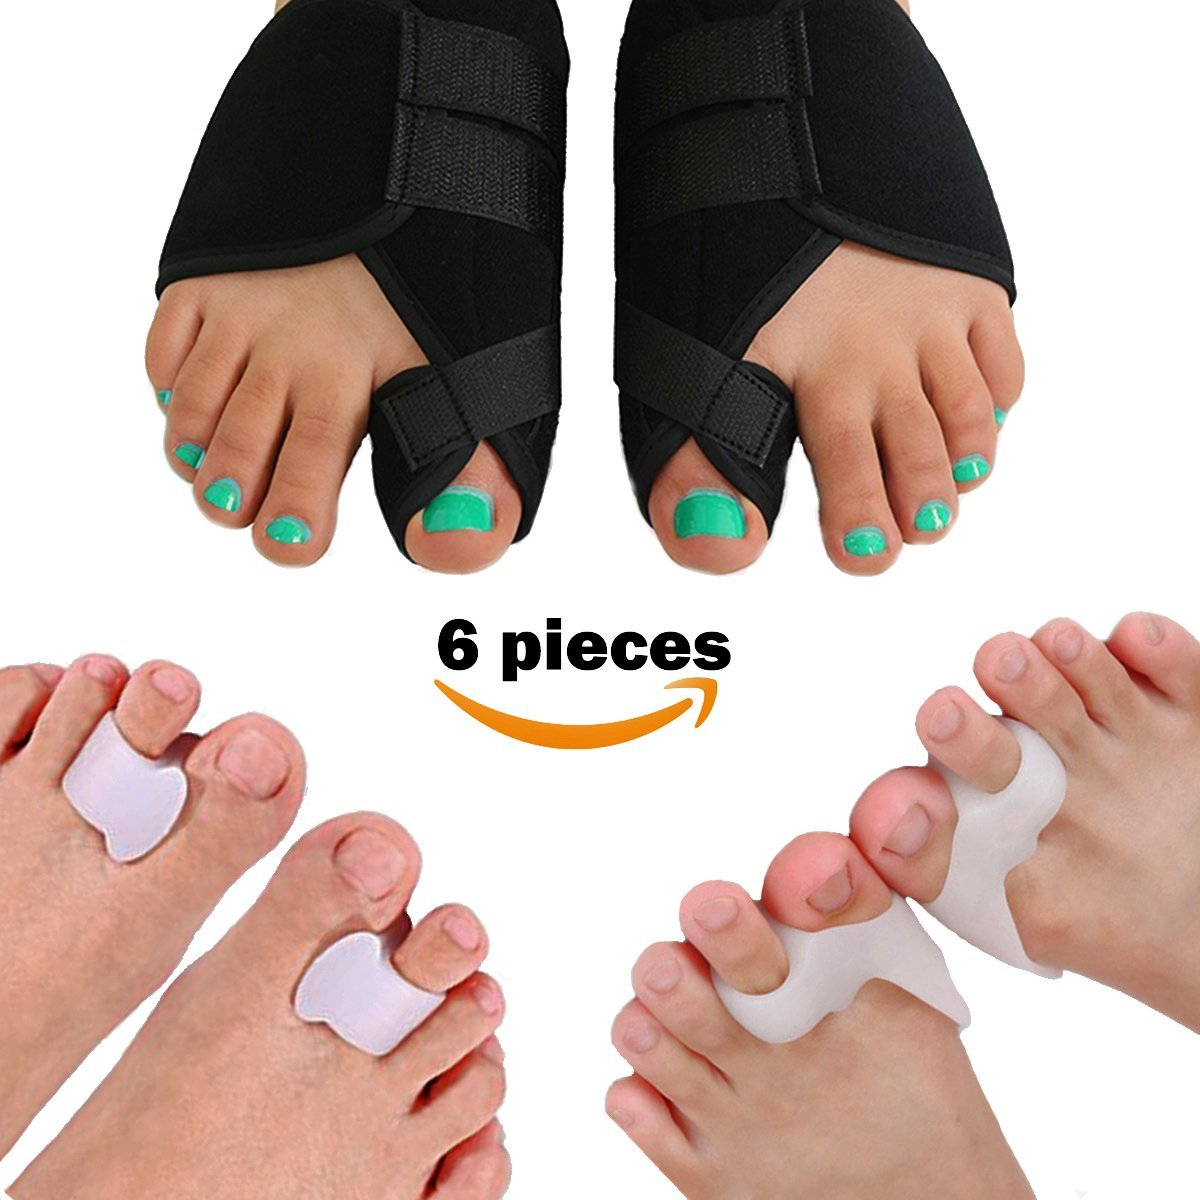 Lejero Bunion Corrector Kit for Men & Women - 6pcs Gel Toe Separators & Orthopedic Bunion Splint, Hallux Valgus Brace, Bunion Cushions & Pad, Toe Spacers, Tailors Bunion Corrector for Girls (Medium)